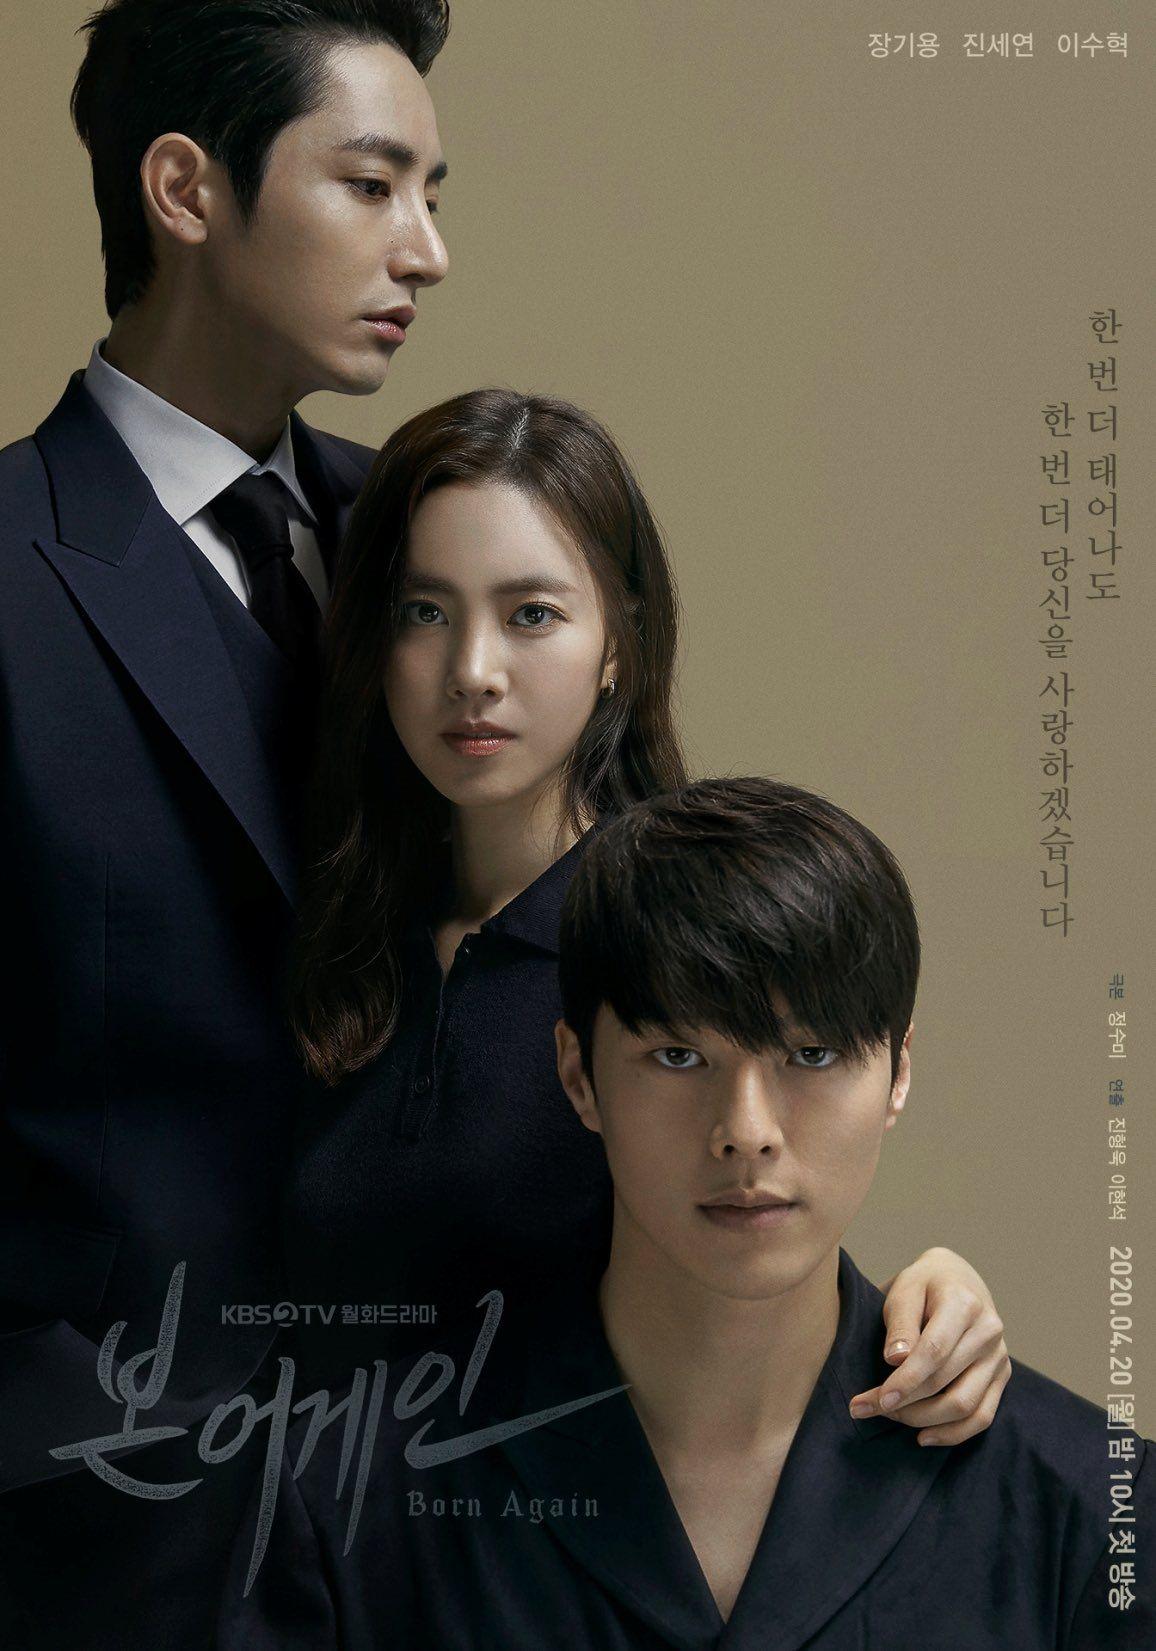 Born Again Kdrama Korejskie Melodramy Korejskaya Drama Drama